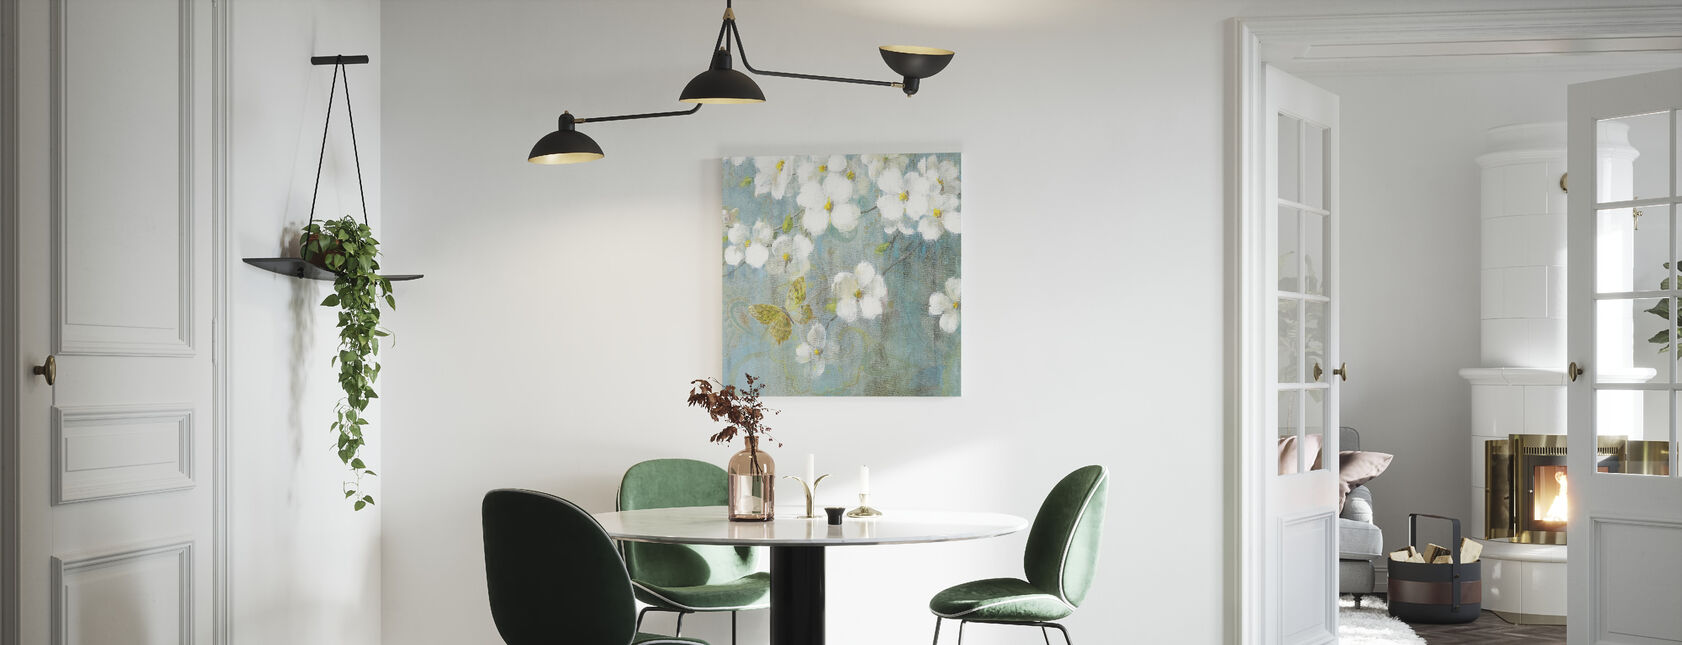 Lente droom 2 - Canvas print - Keuken